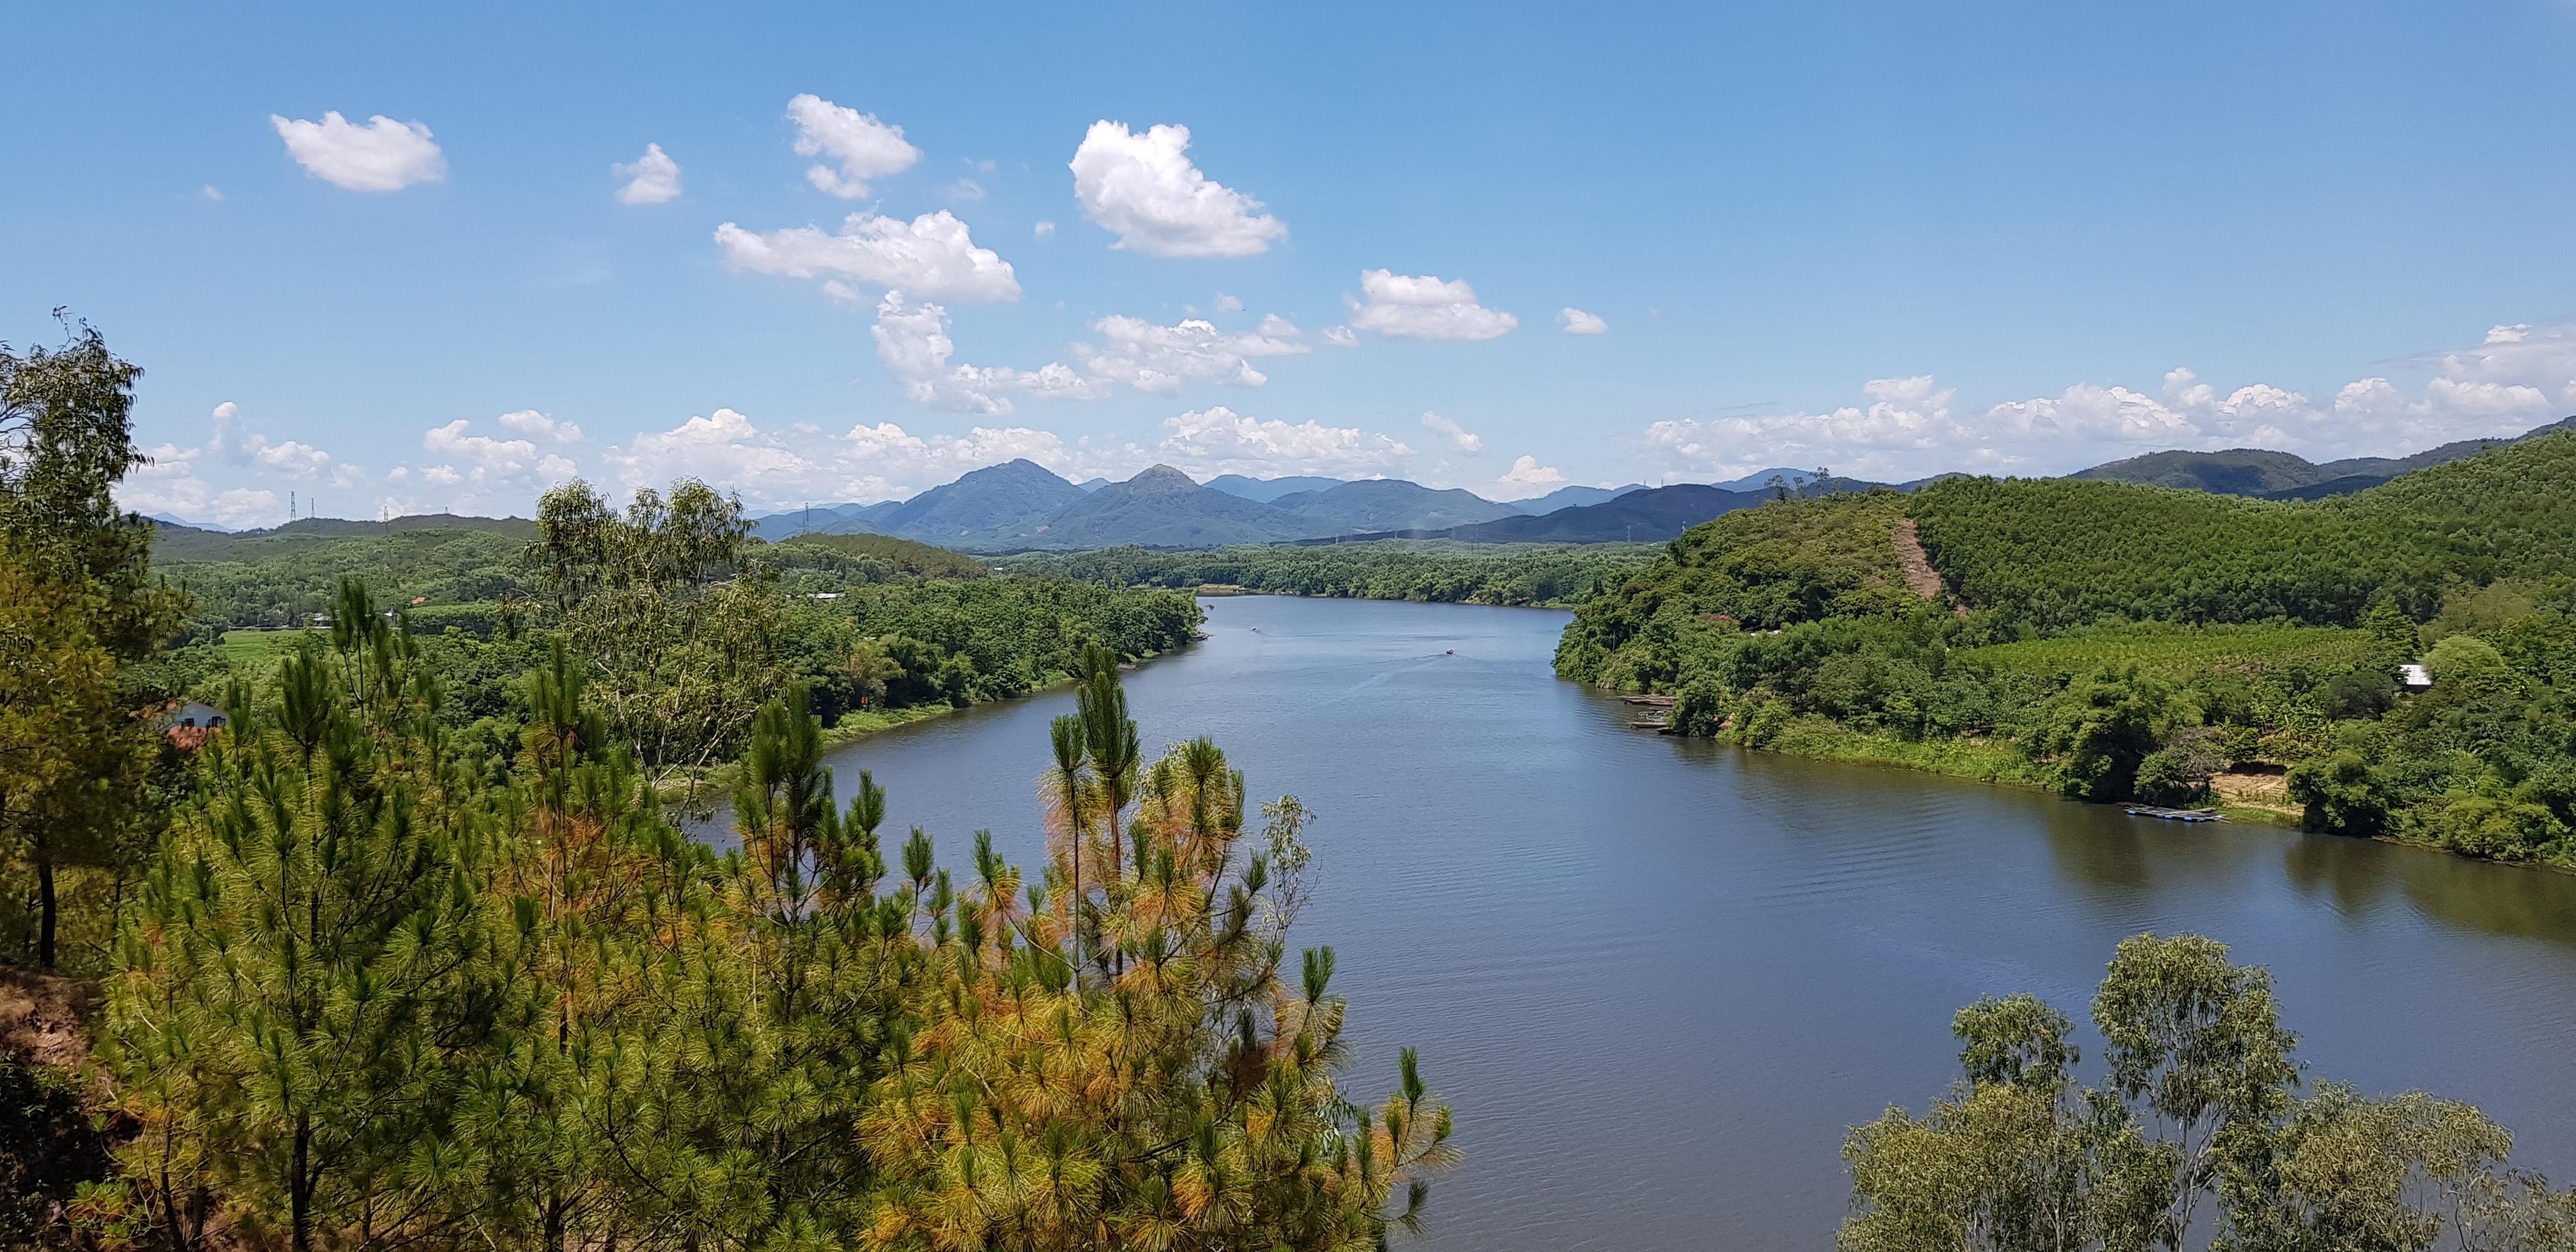 Hue to Da Nang: Perfume River